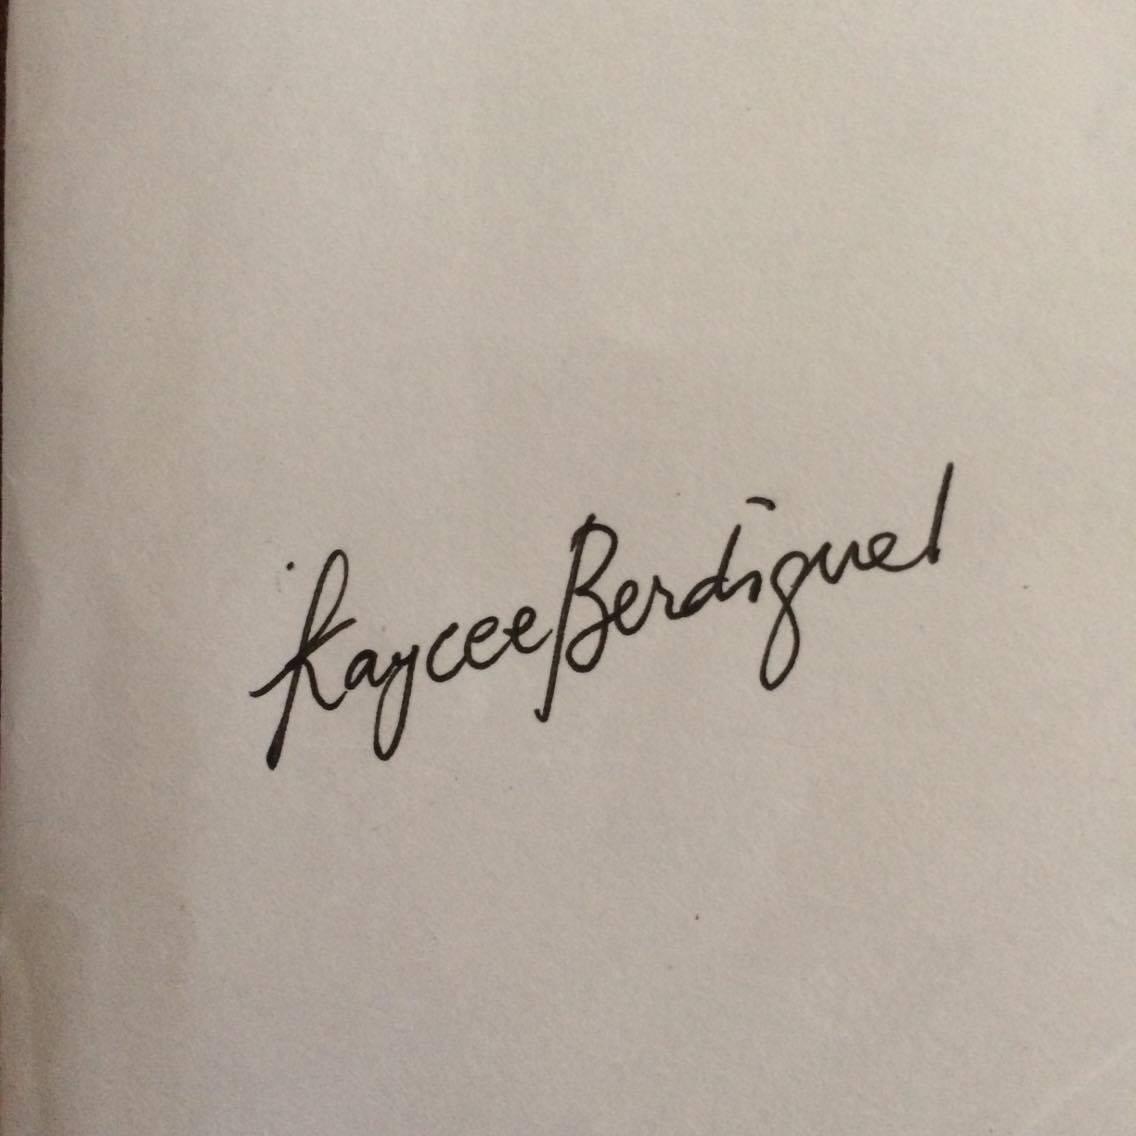 Kaycee Berdiguel Signature